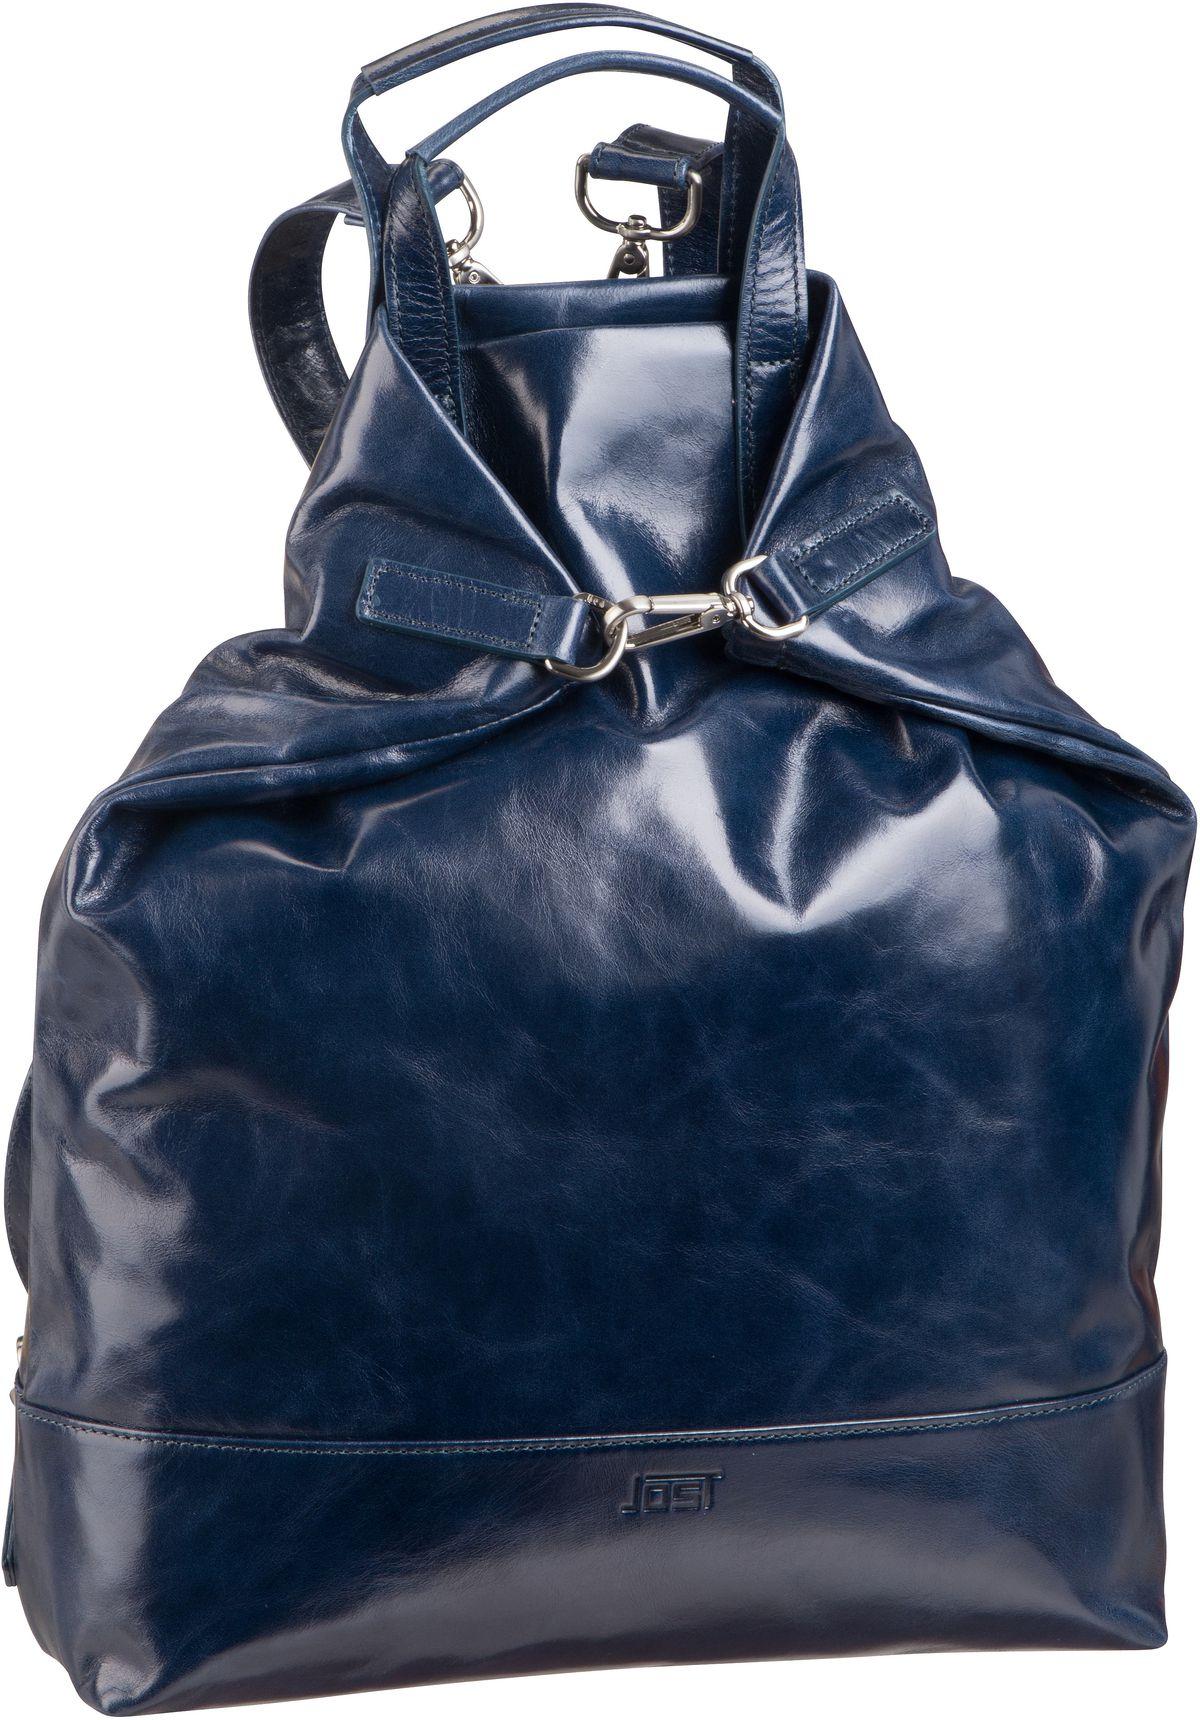 Rucksack / Daypack Boda 6632 X-Change Bag M Navy